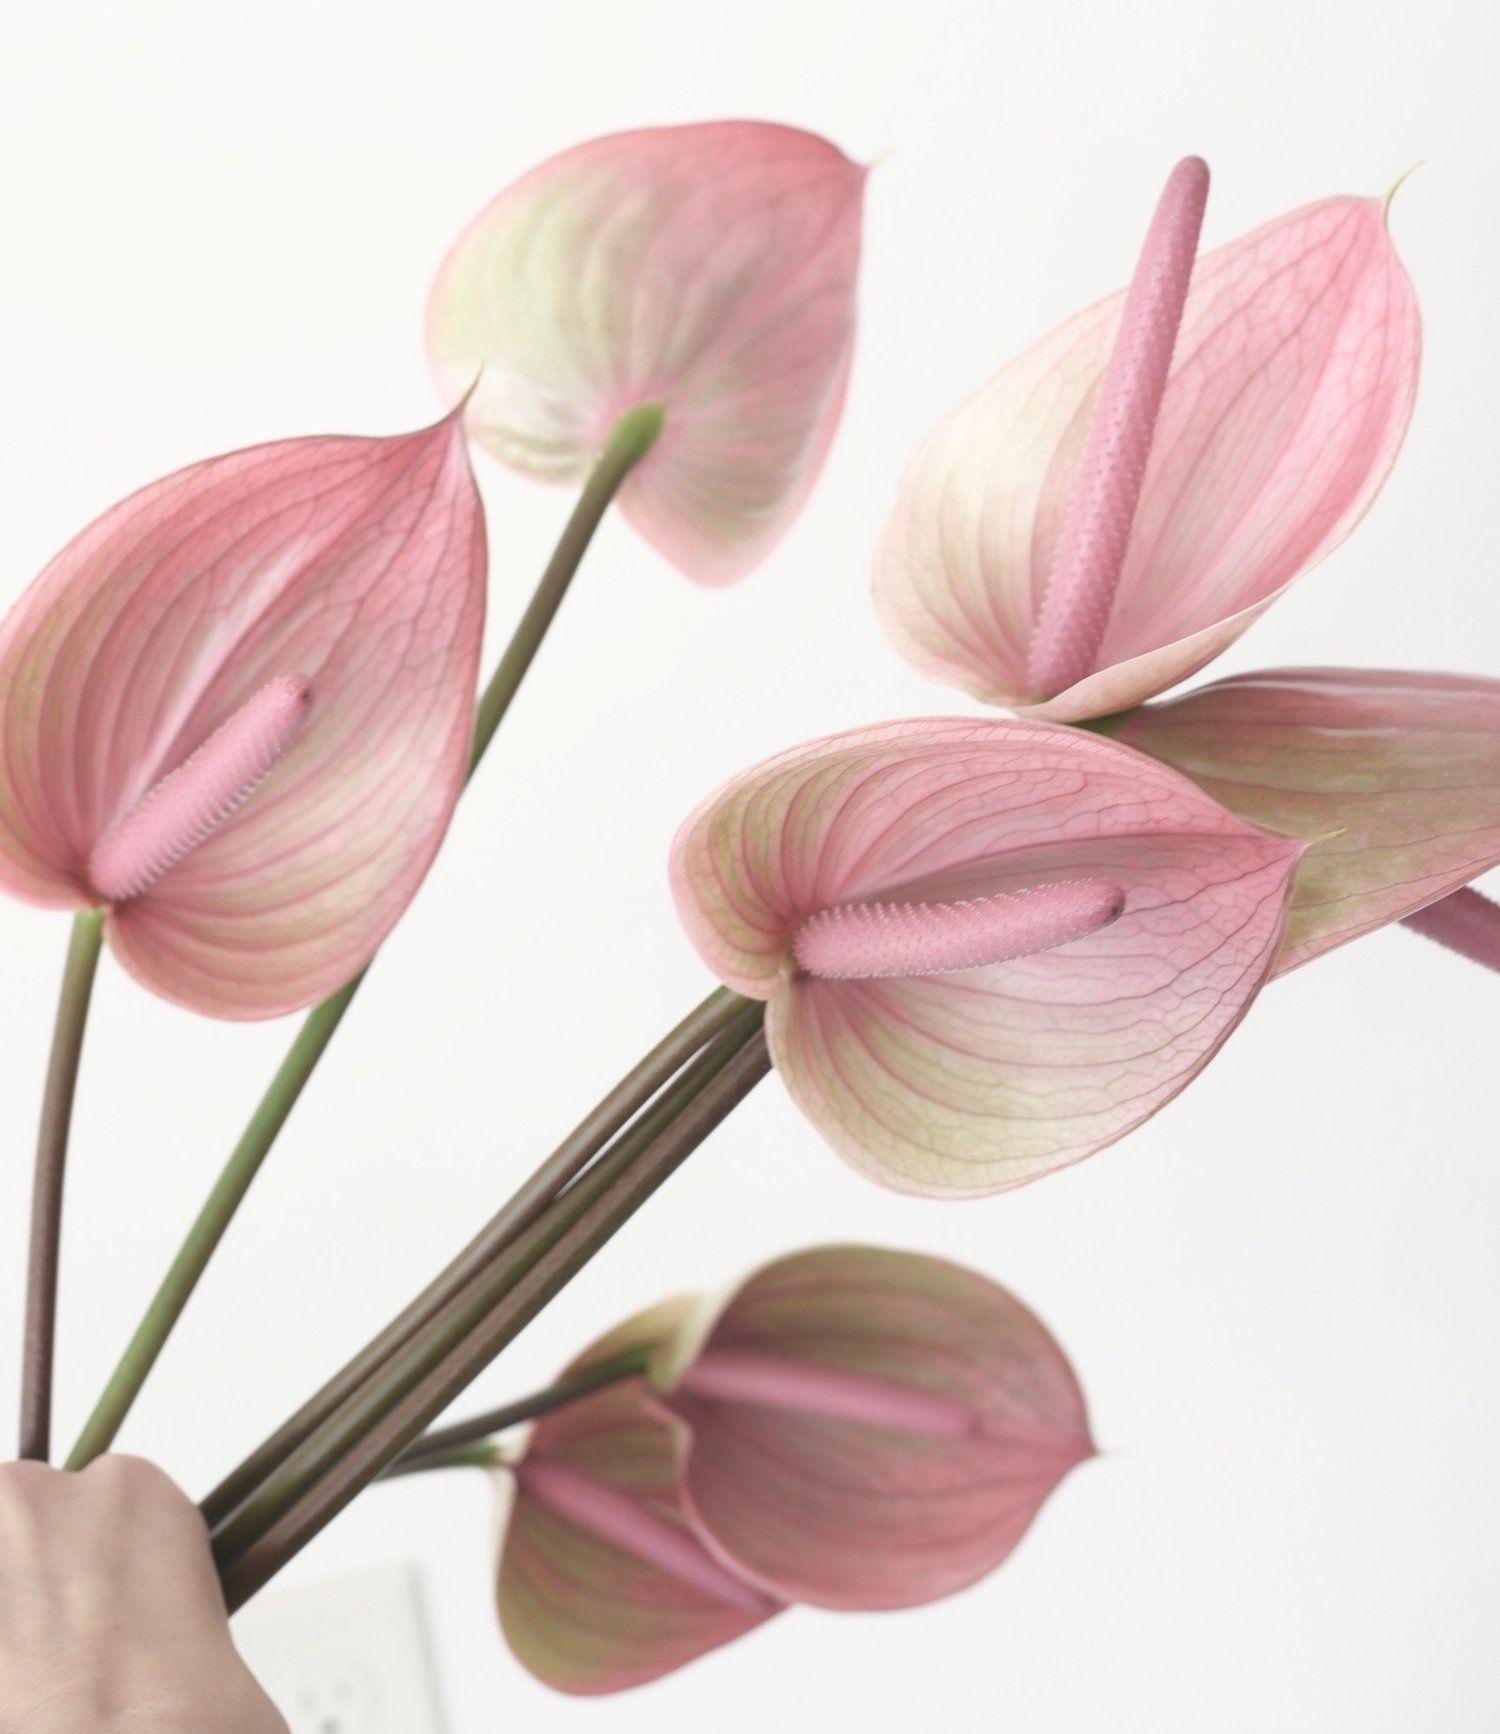 Mauve Anthurium For Contemporary Portland Wedding Color Theory Collective Anthurium Peruzzi Variety Modern Mauve Anthurium Flower Anthurium Flower Guide